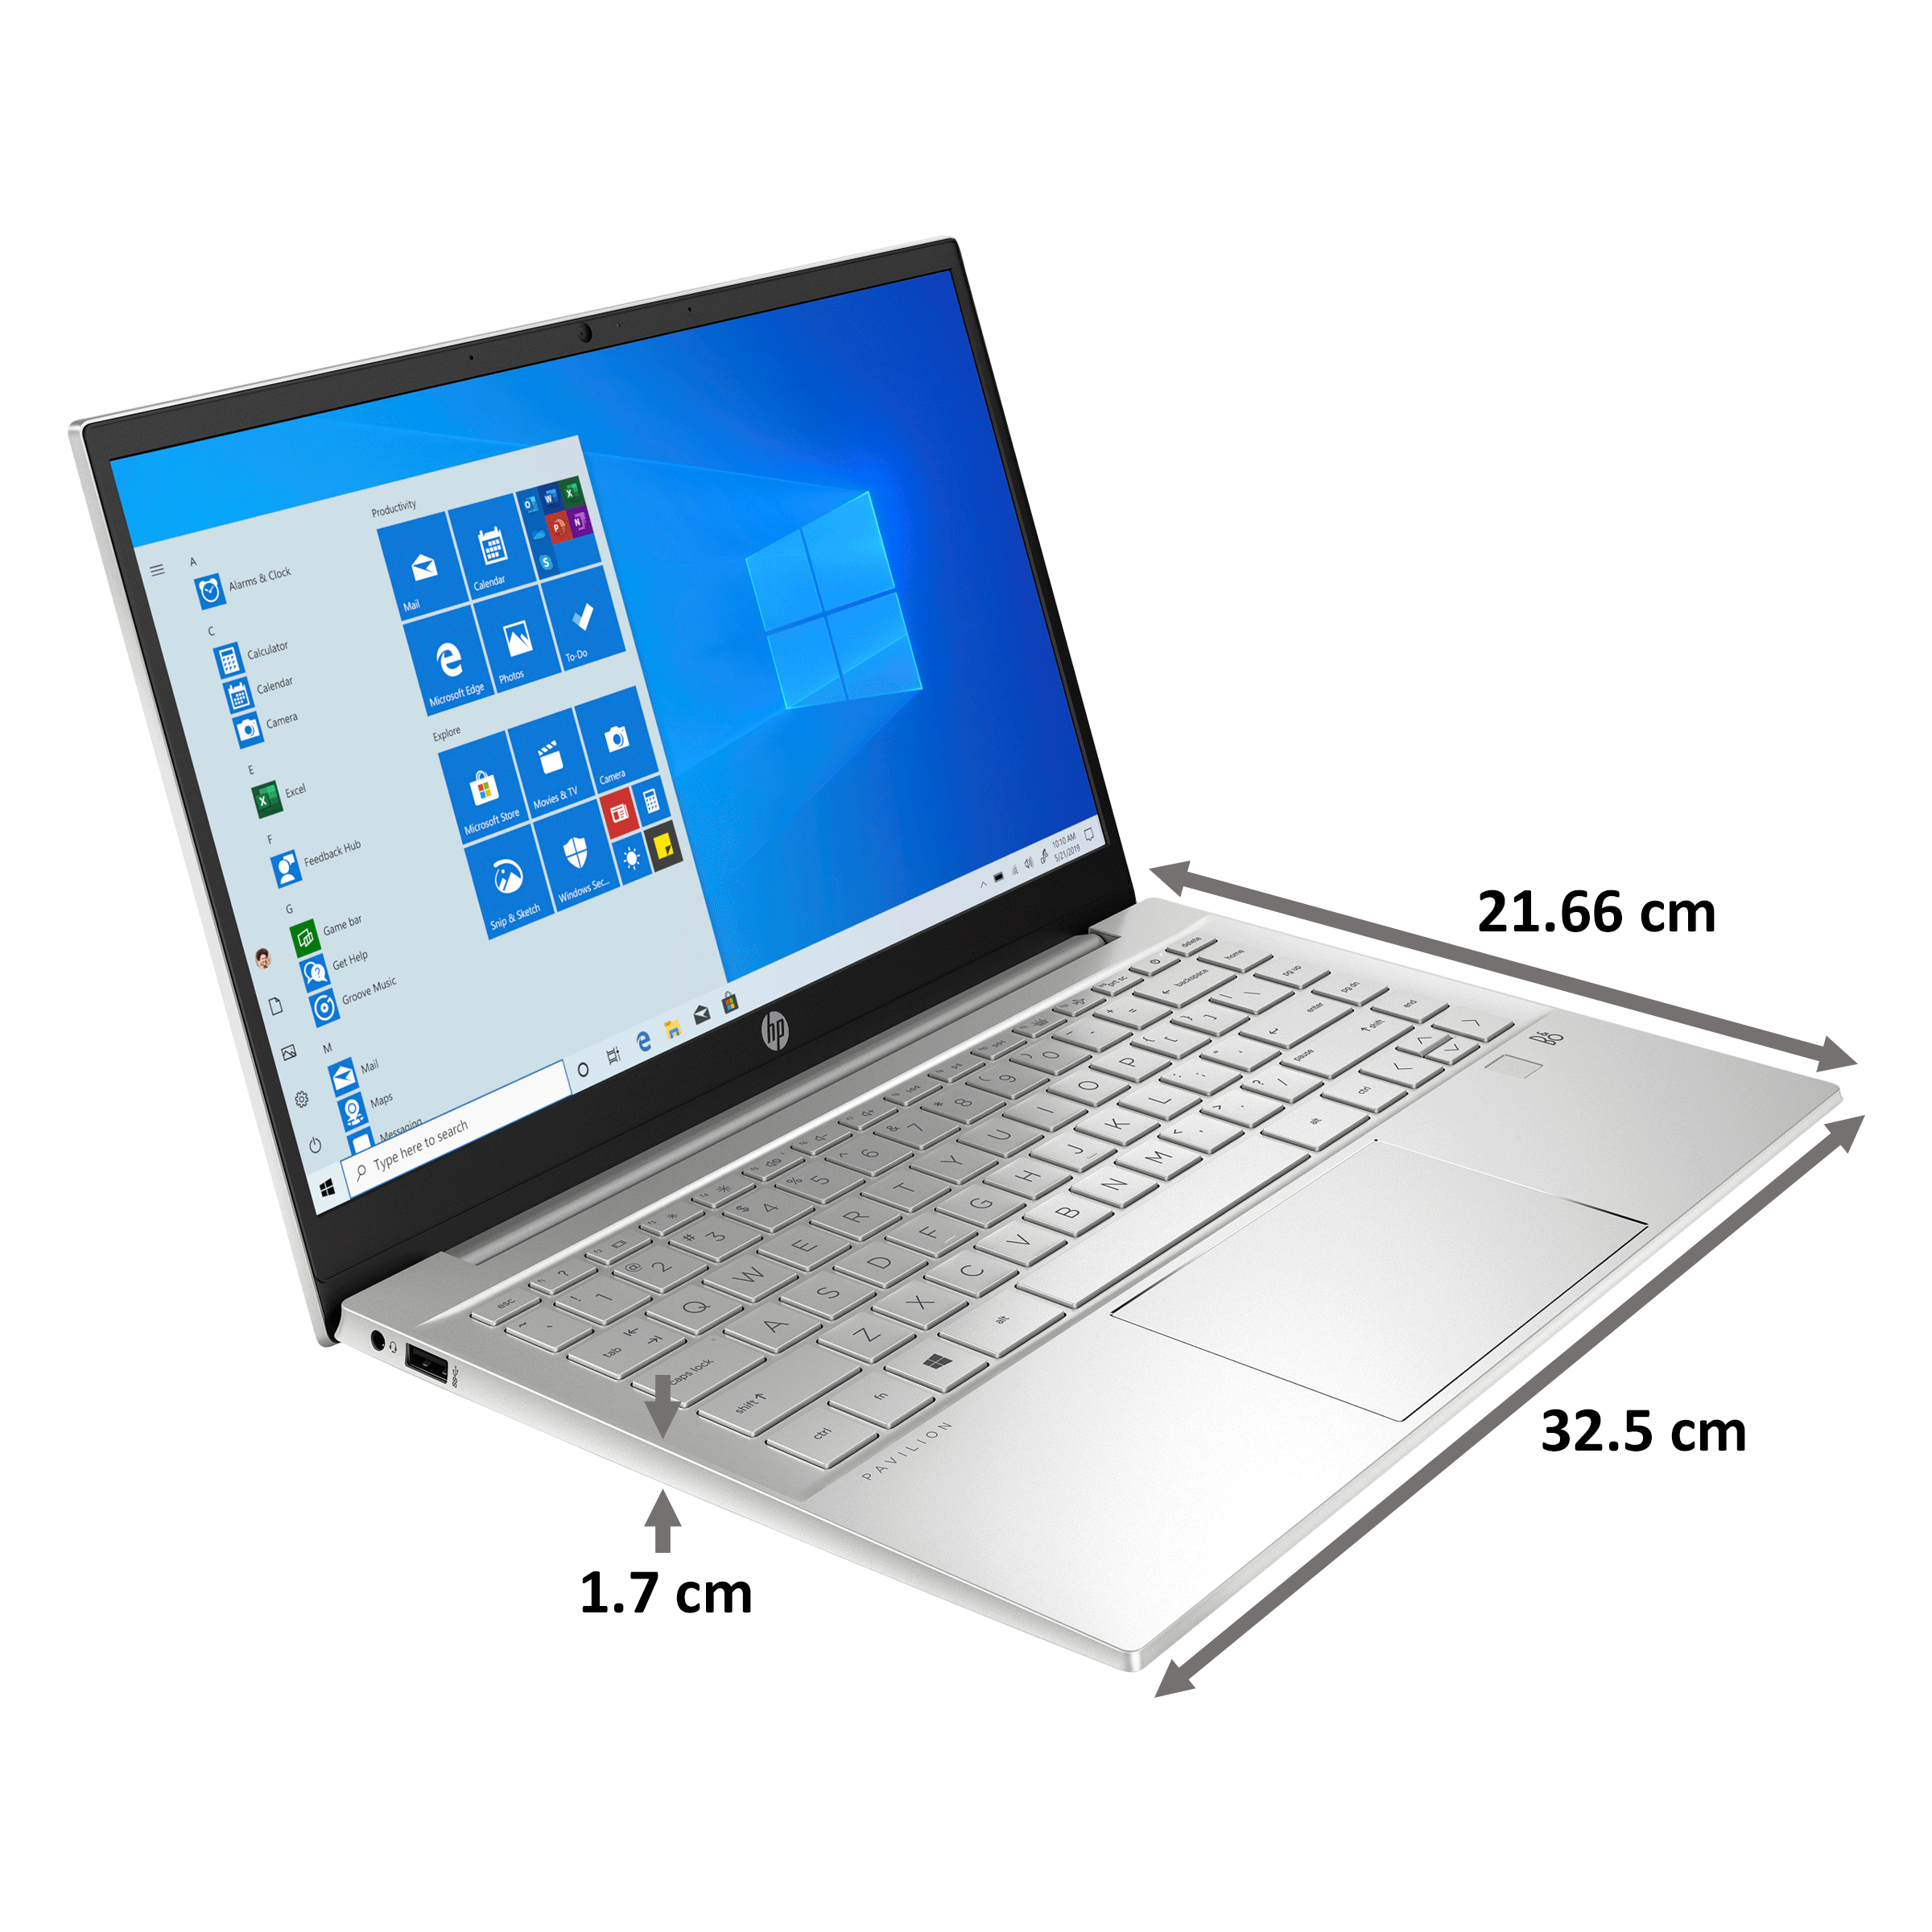 HP Pavilion 14-dv0086TX (397L9PA#ACJ) Core i5 11th Gen Windows 10 Home Laptop (16GB RAM, 512GB SSD, GeForce MX450 + 2GB Graphics, MS Office,... 2